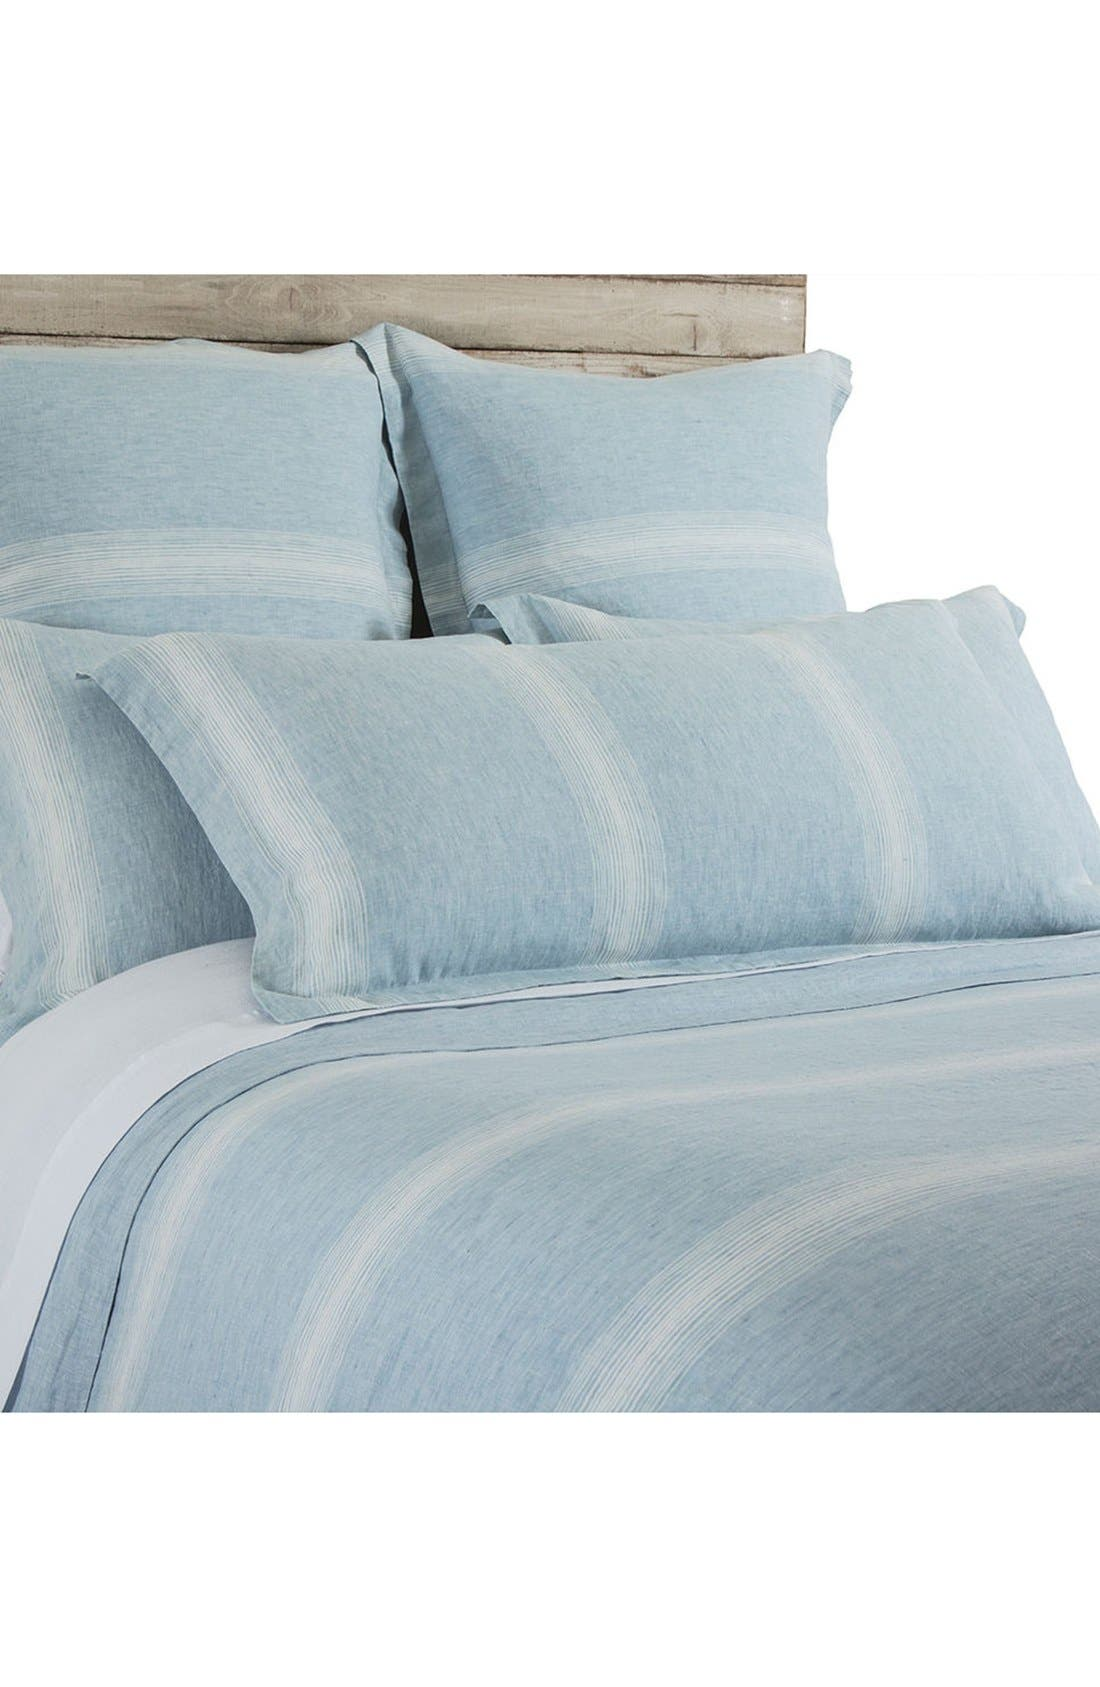 Harper Euro Sham,                         Main,                         color, Blue/ White